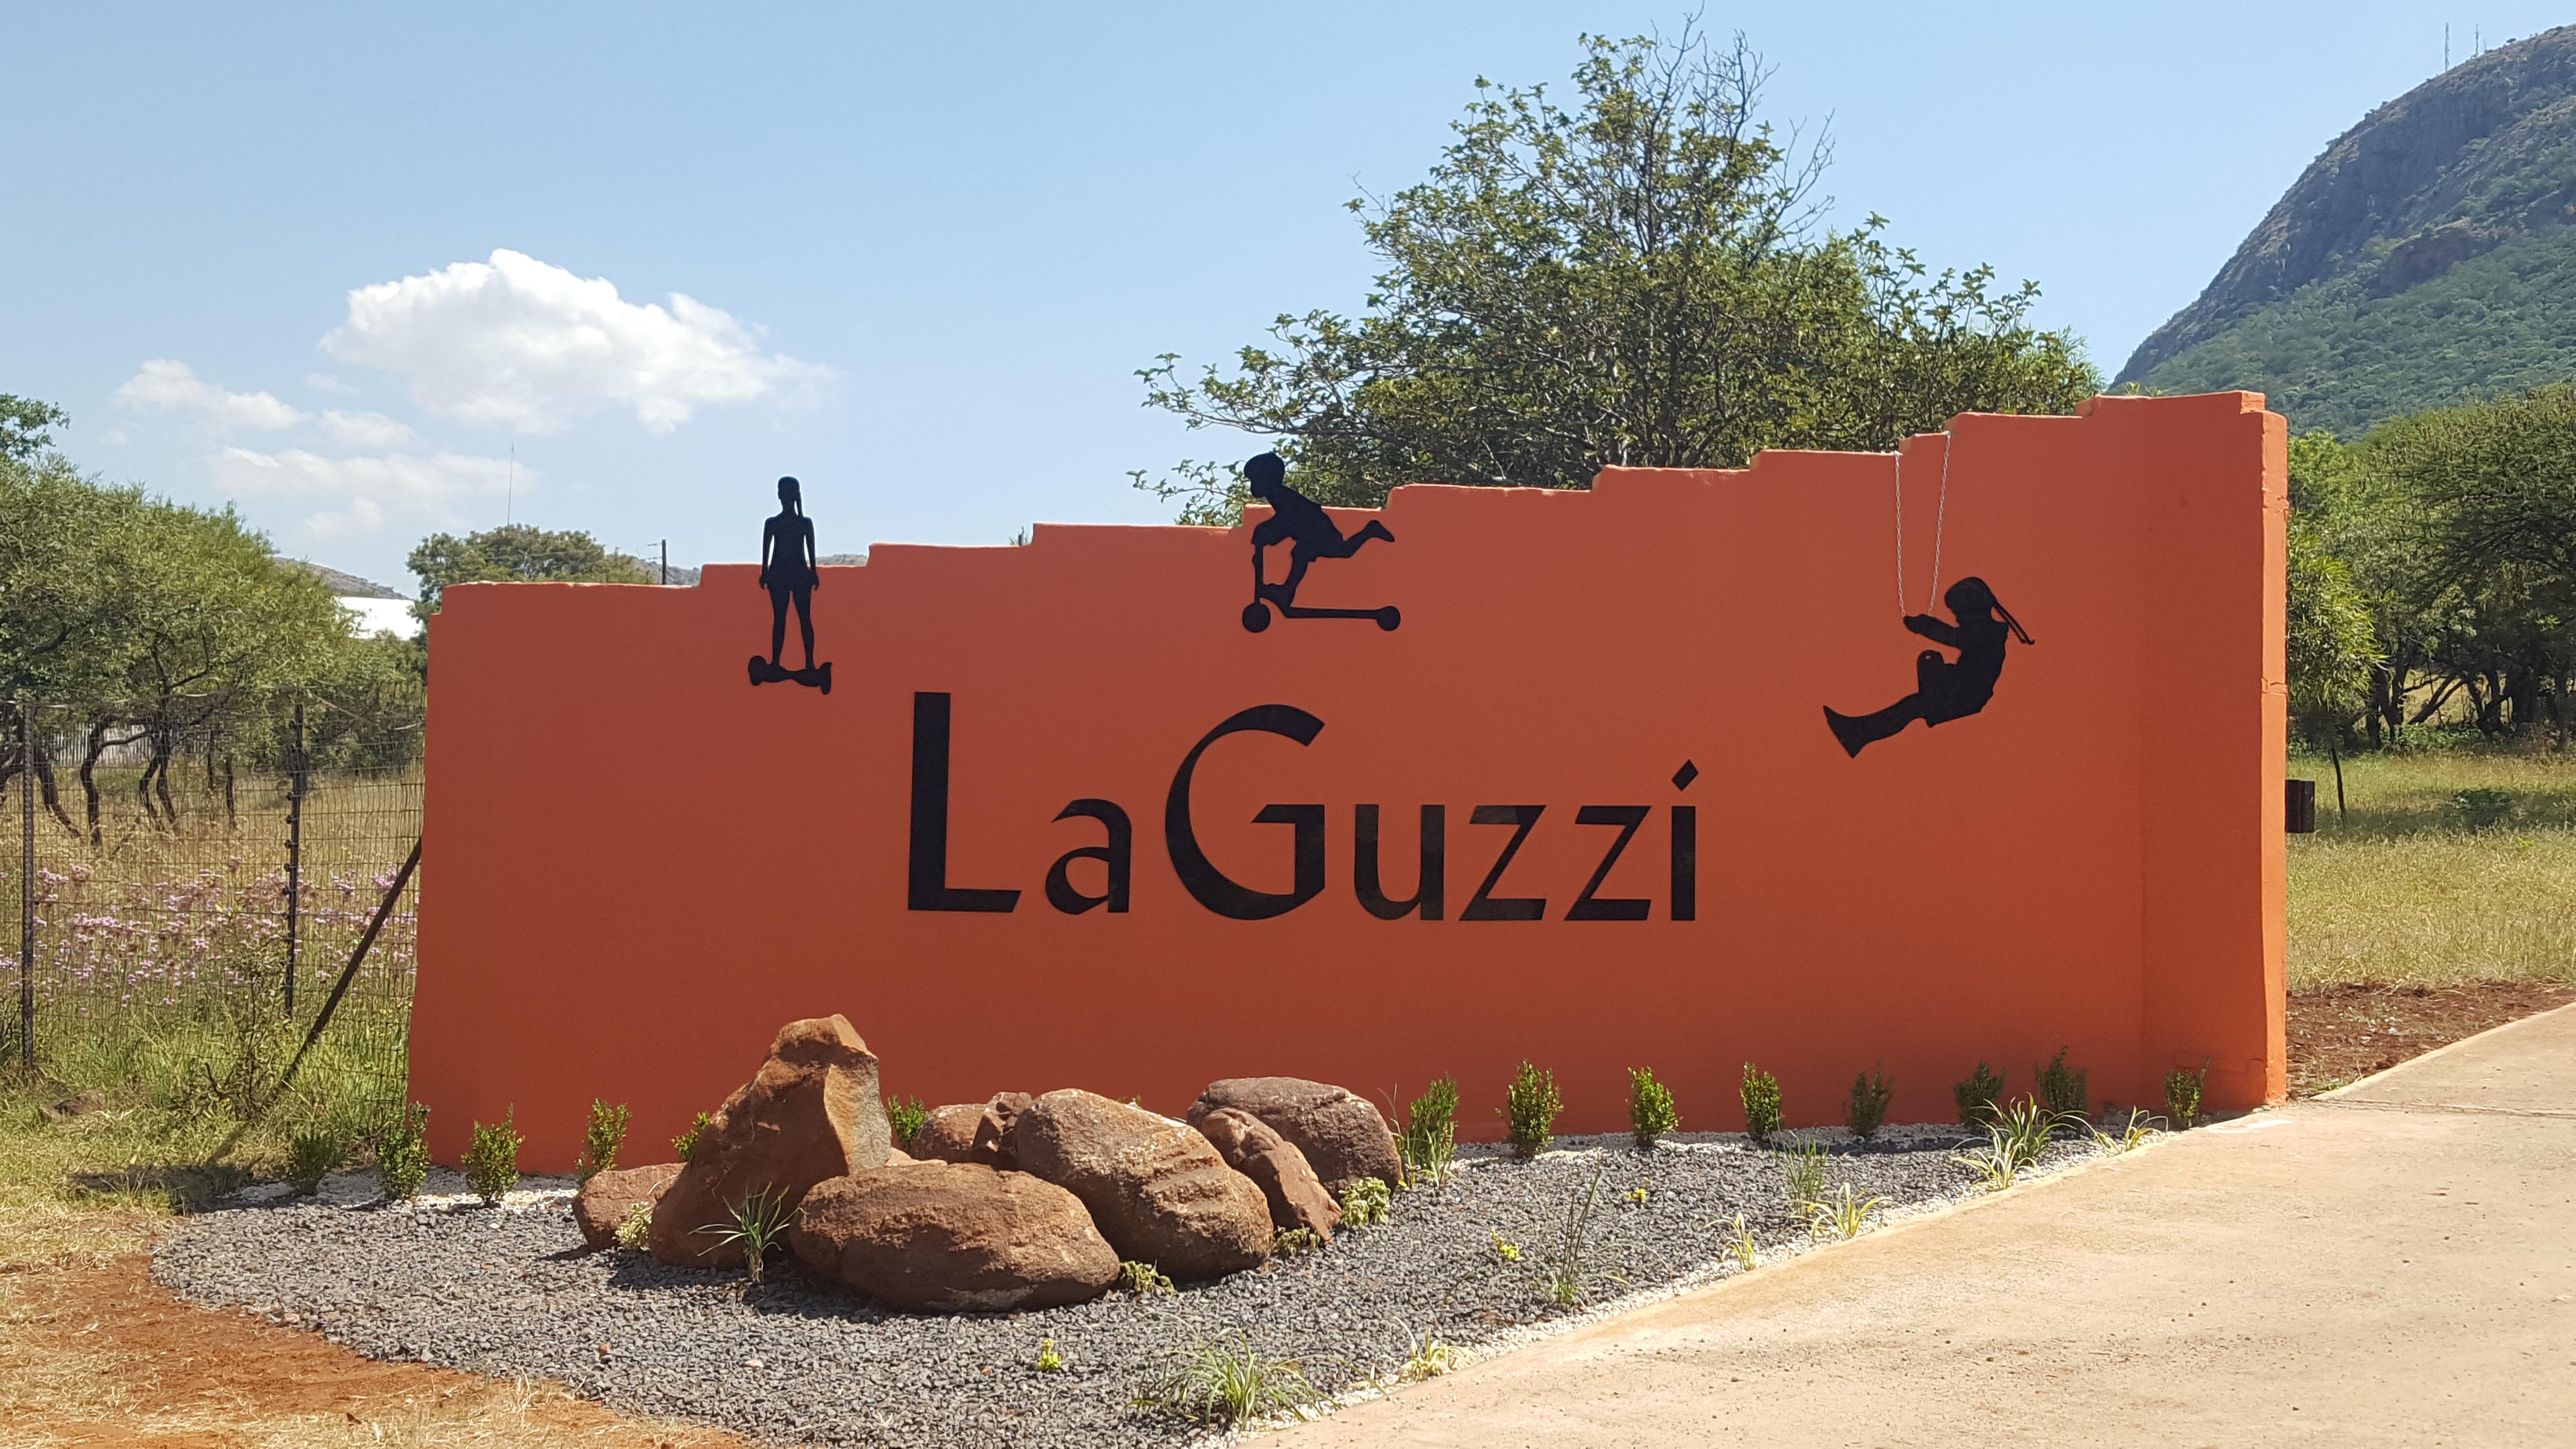 LaGuzzi wall 3.jpg